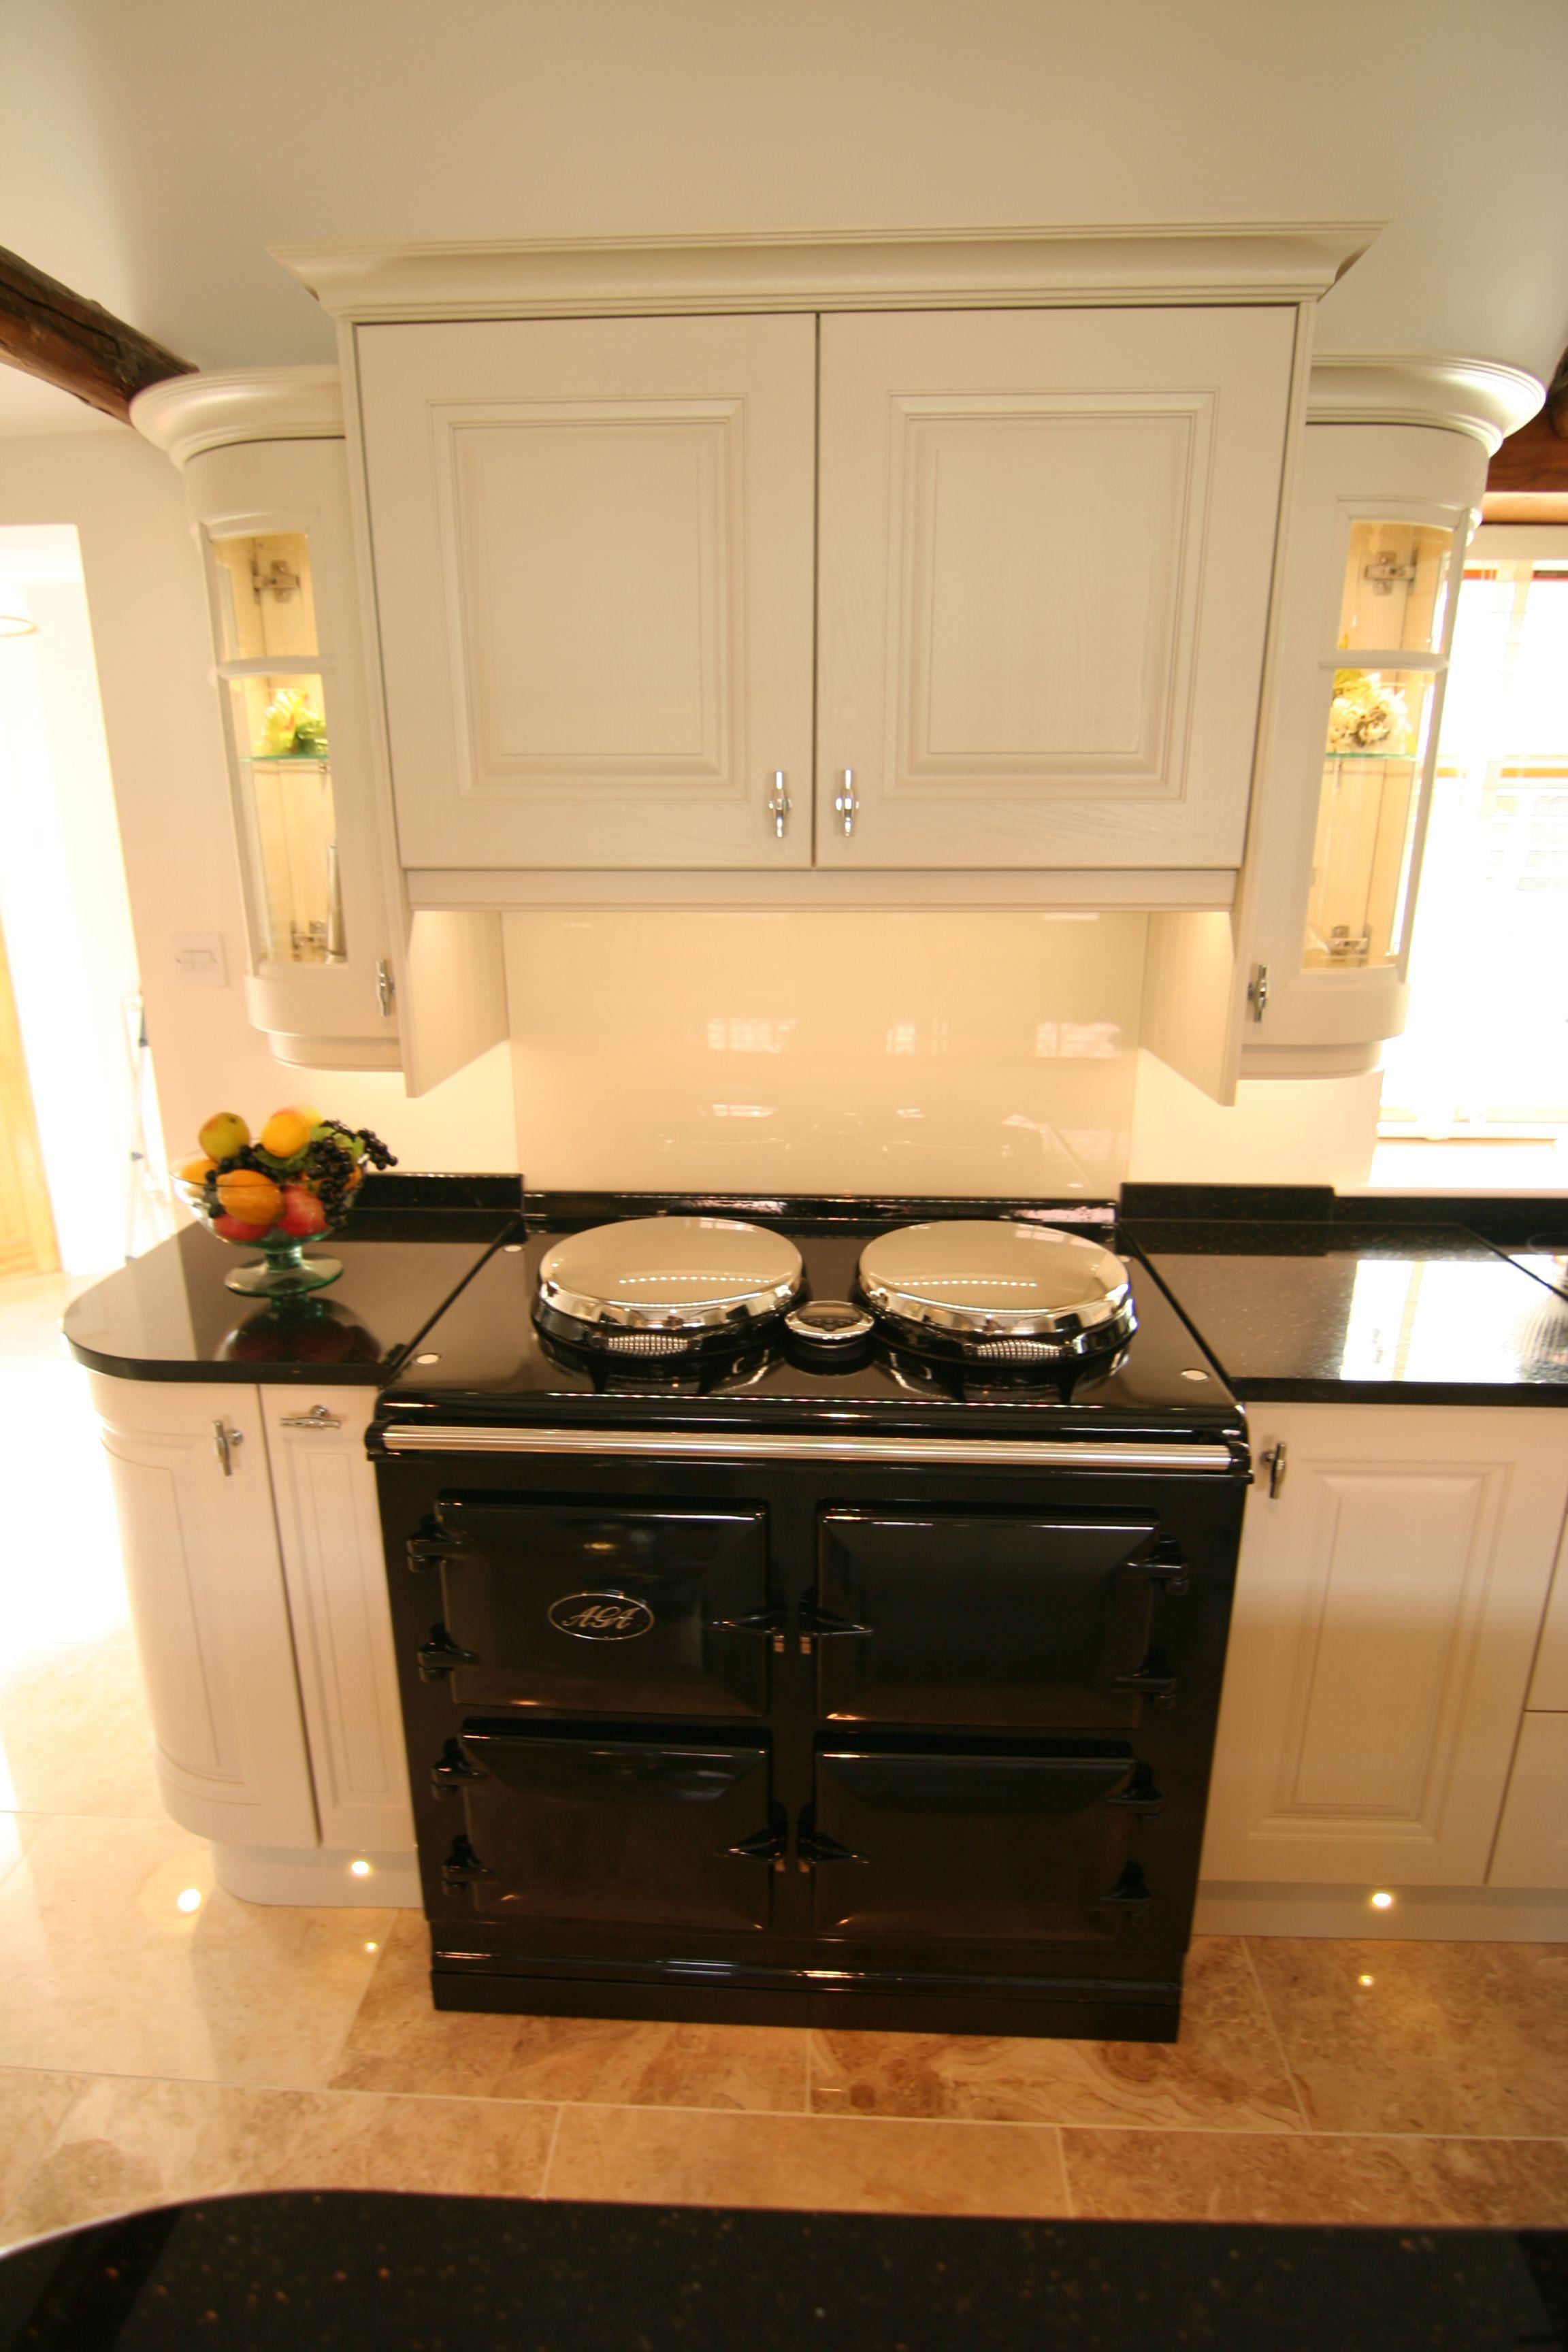 AGA range cooker, Glass splash back, Glass Curved wall units.